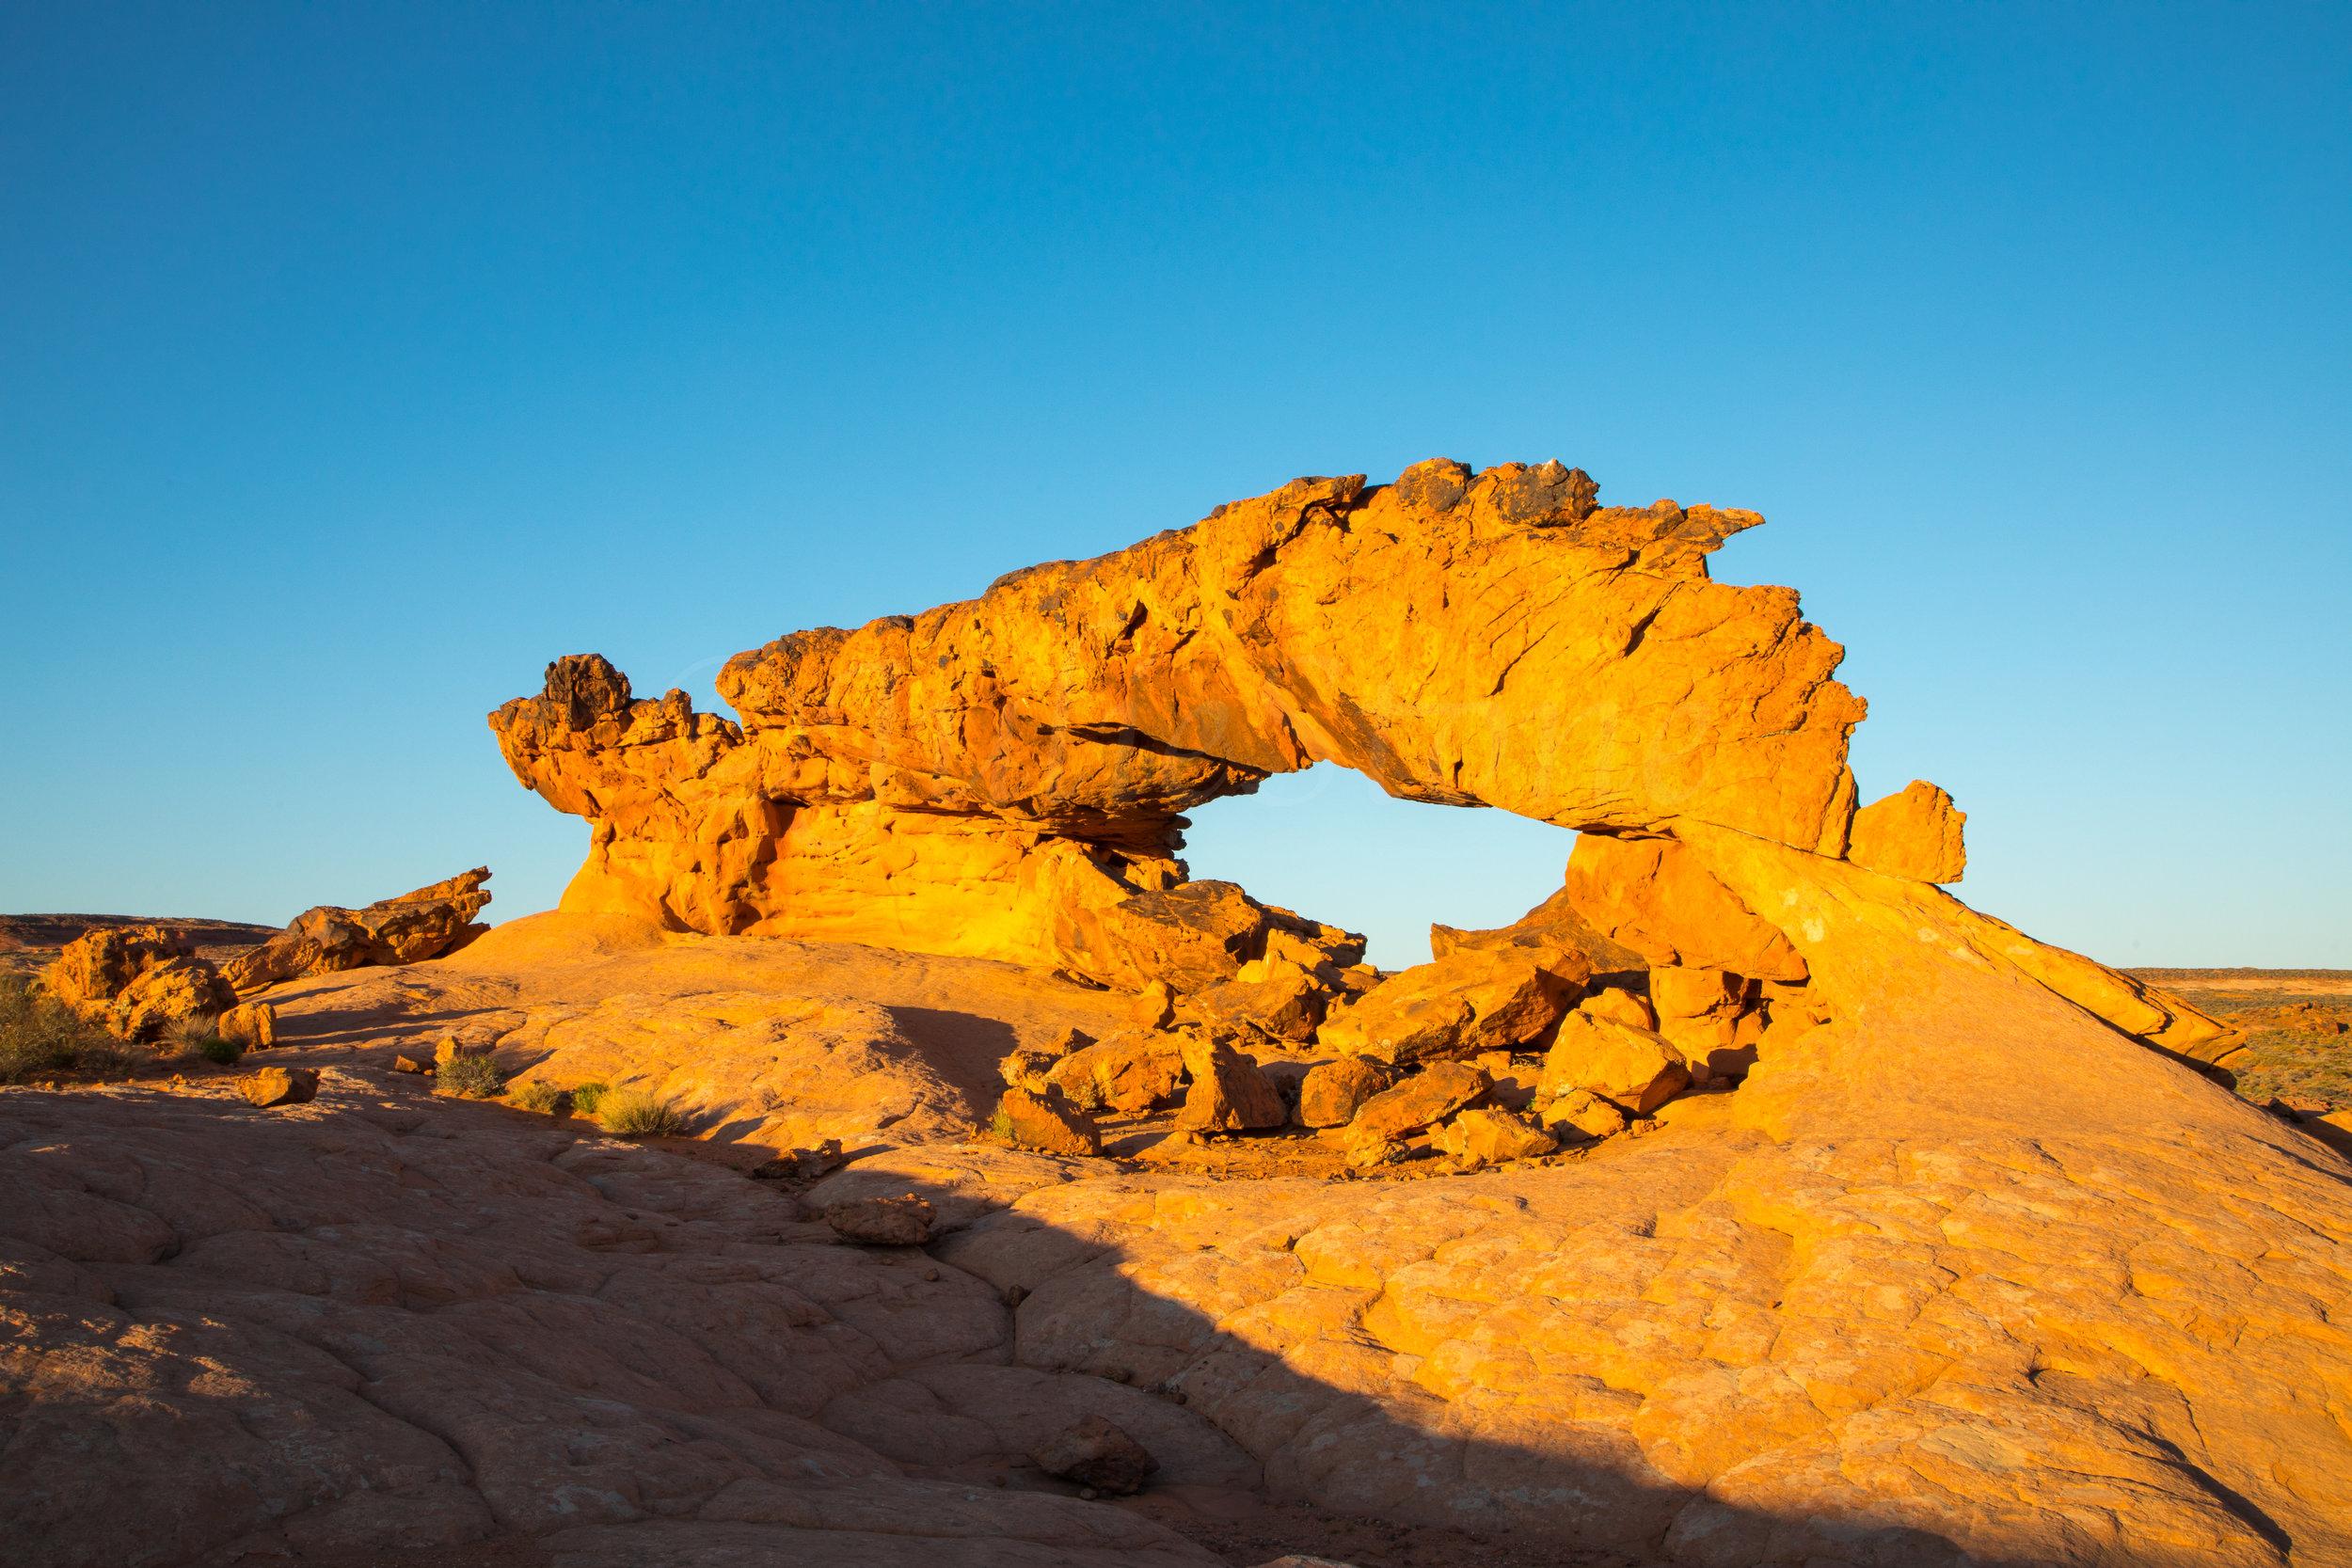 Sunset Arch, Image # 3040